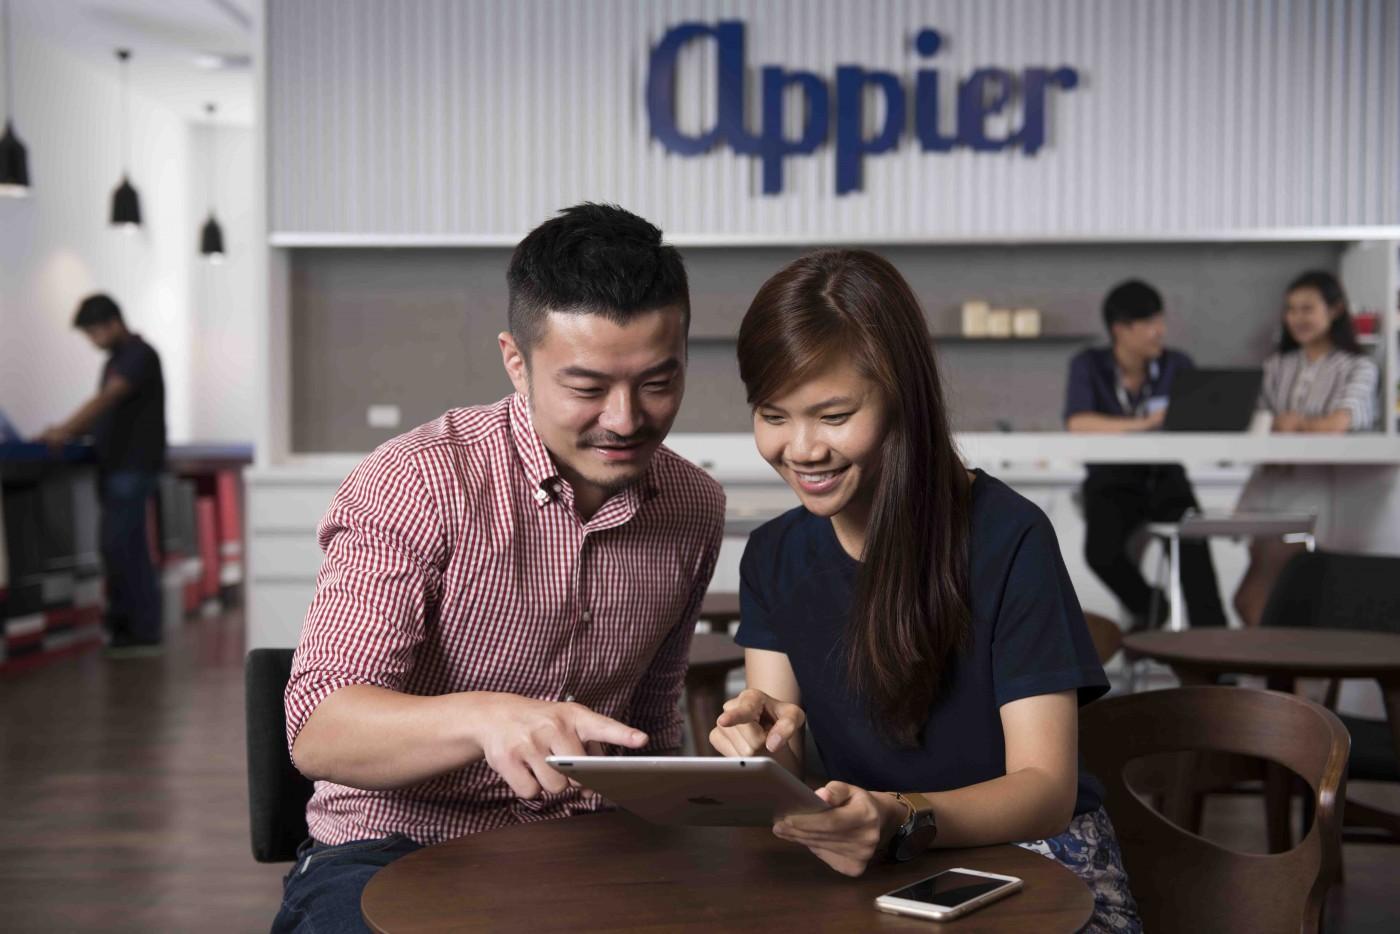 Appier再度入選全球AI 100大,這家公司如何幫助企業挖掘資料中的寶藏?